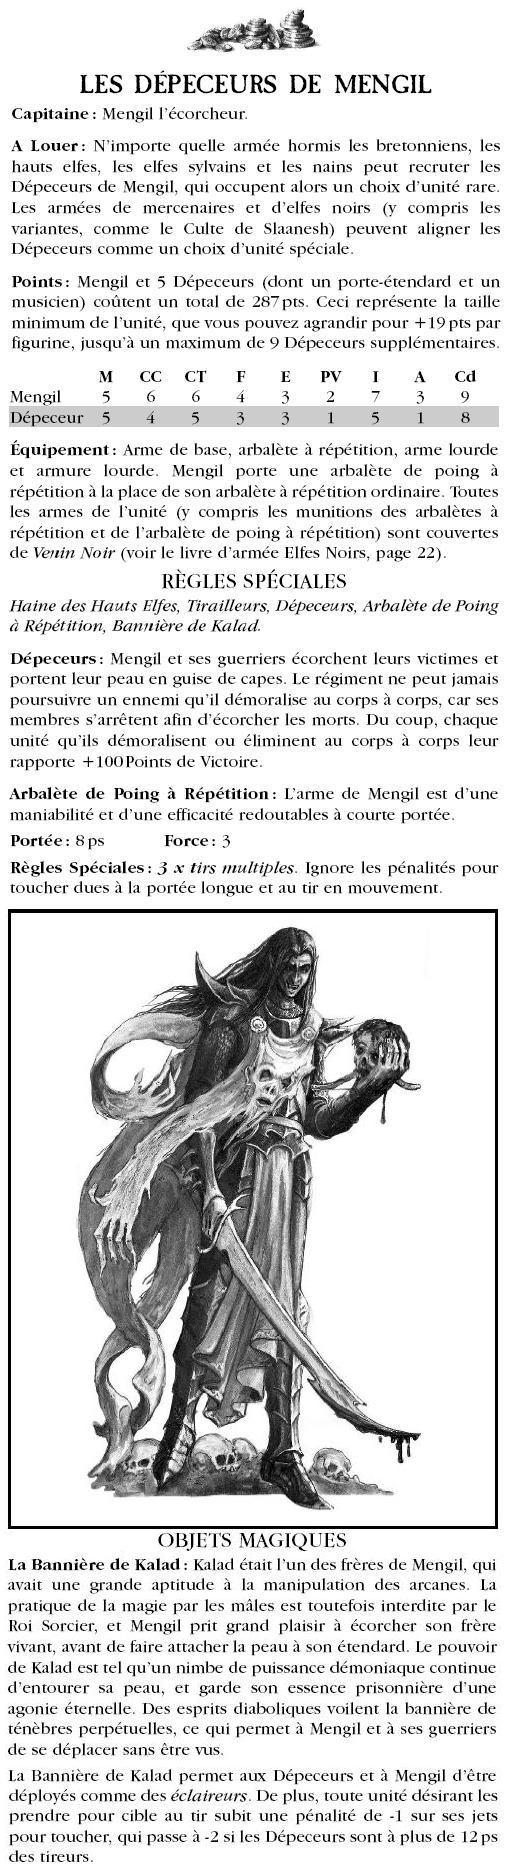 [Régle]Unités Mercenaires a Louer Dapeuc13.jpg